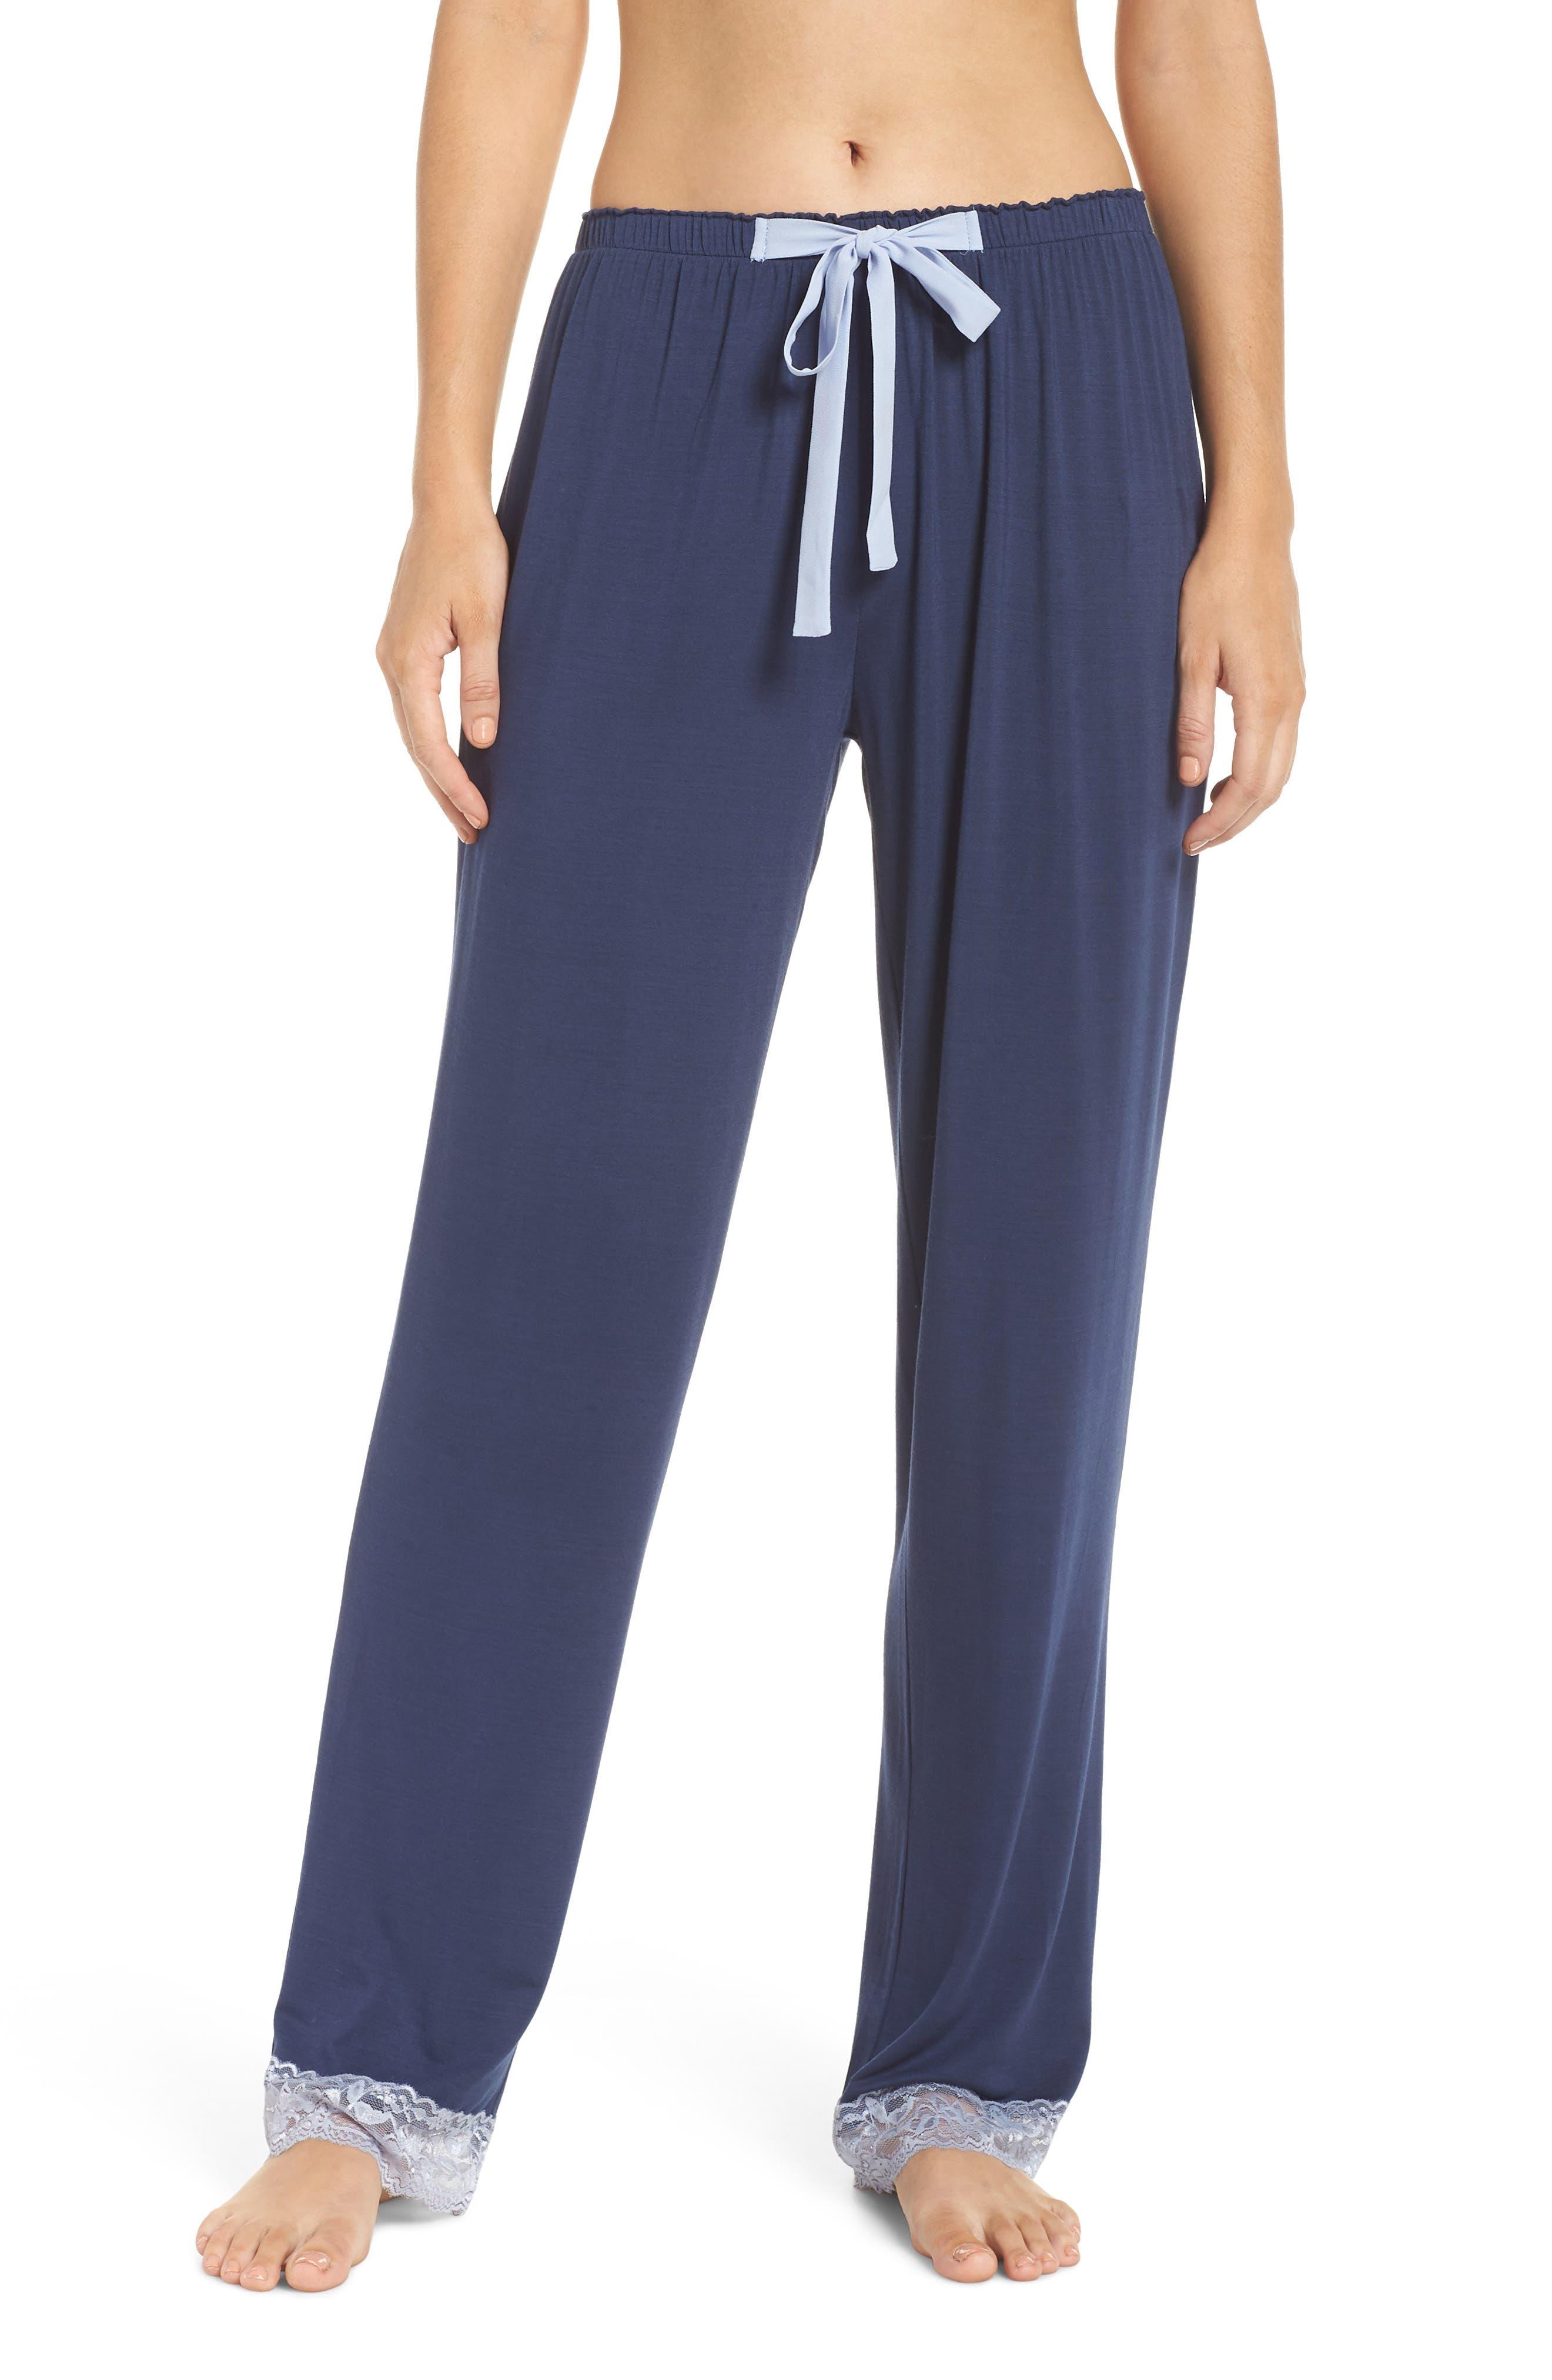 Snuggle Lounge Pants,                             Main thumbnail 1, color,                             STEEL BLUE